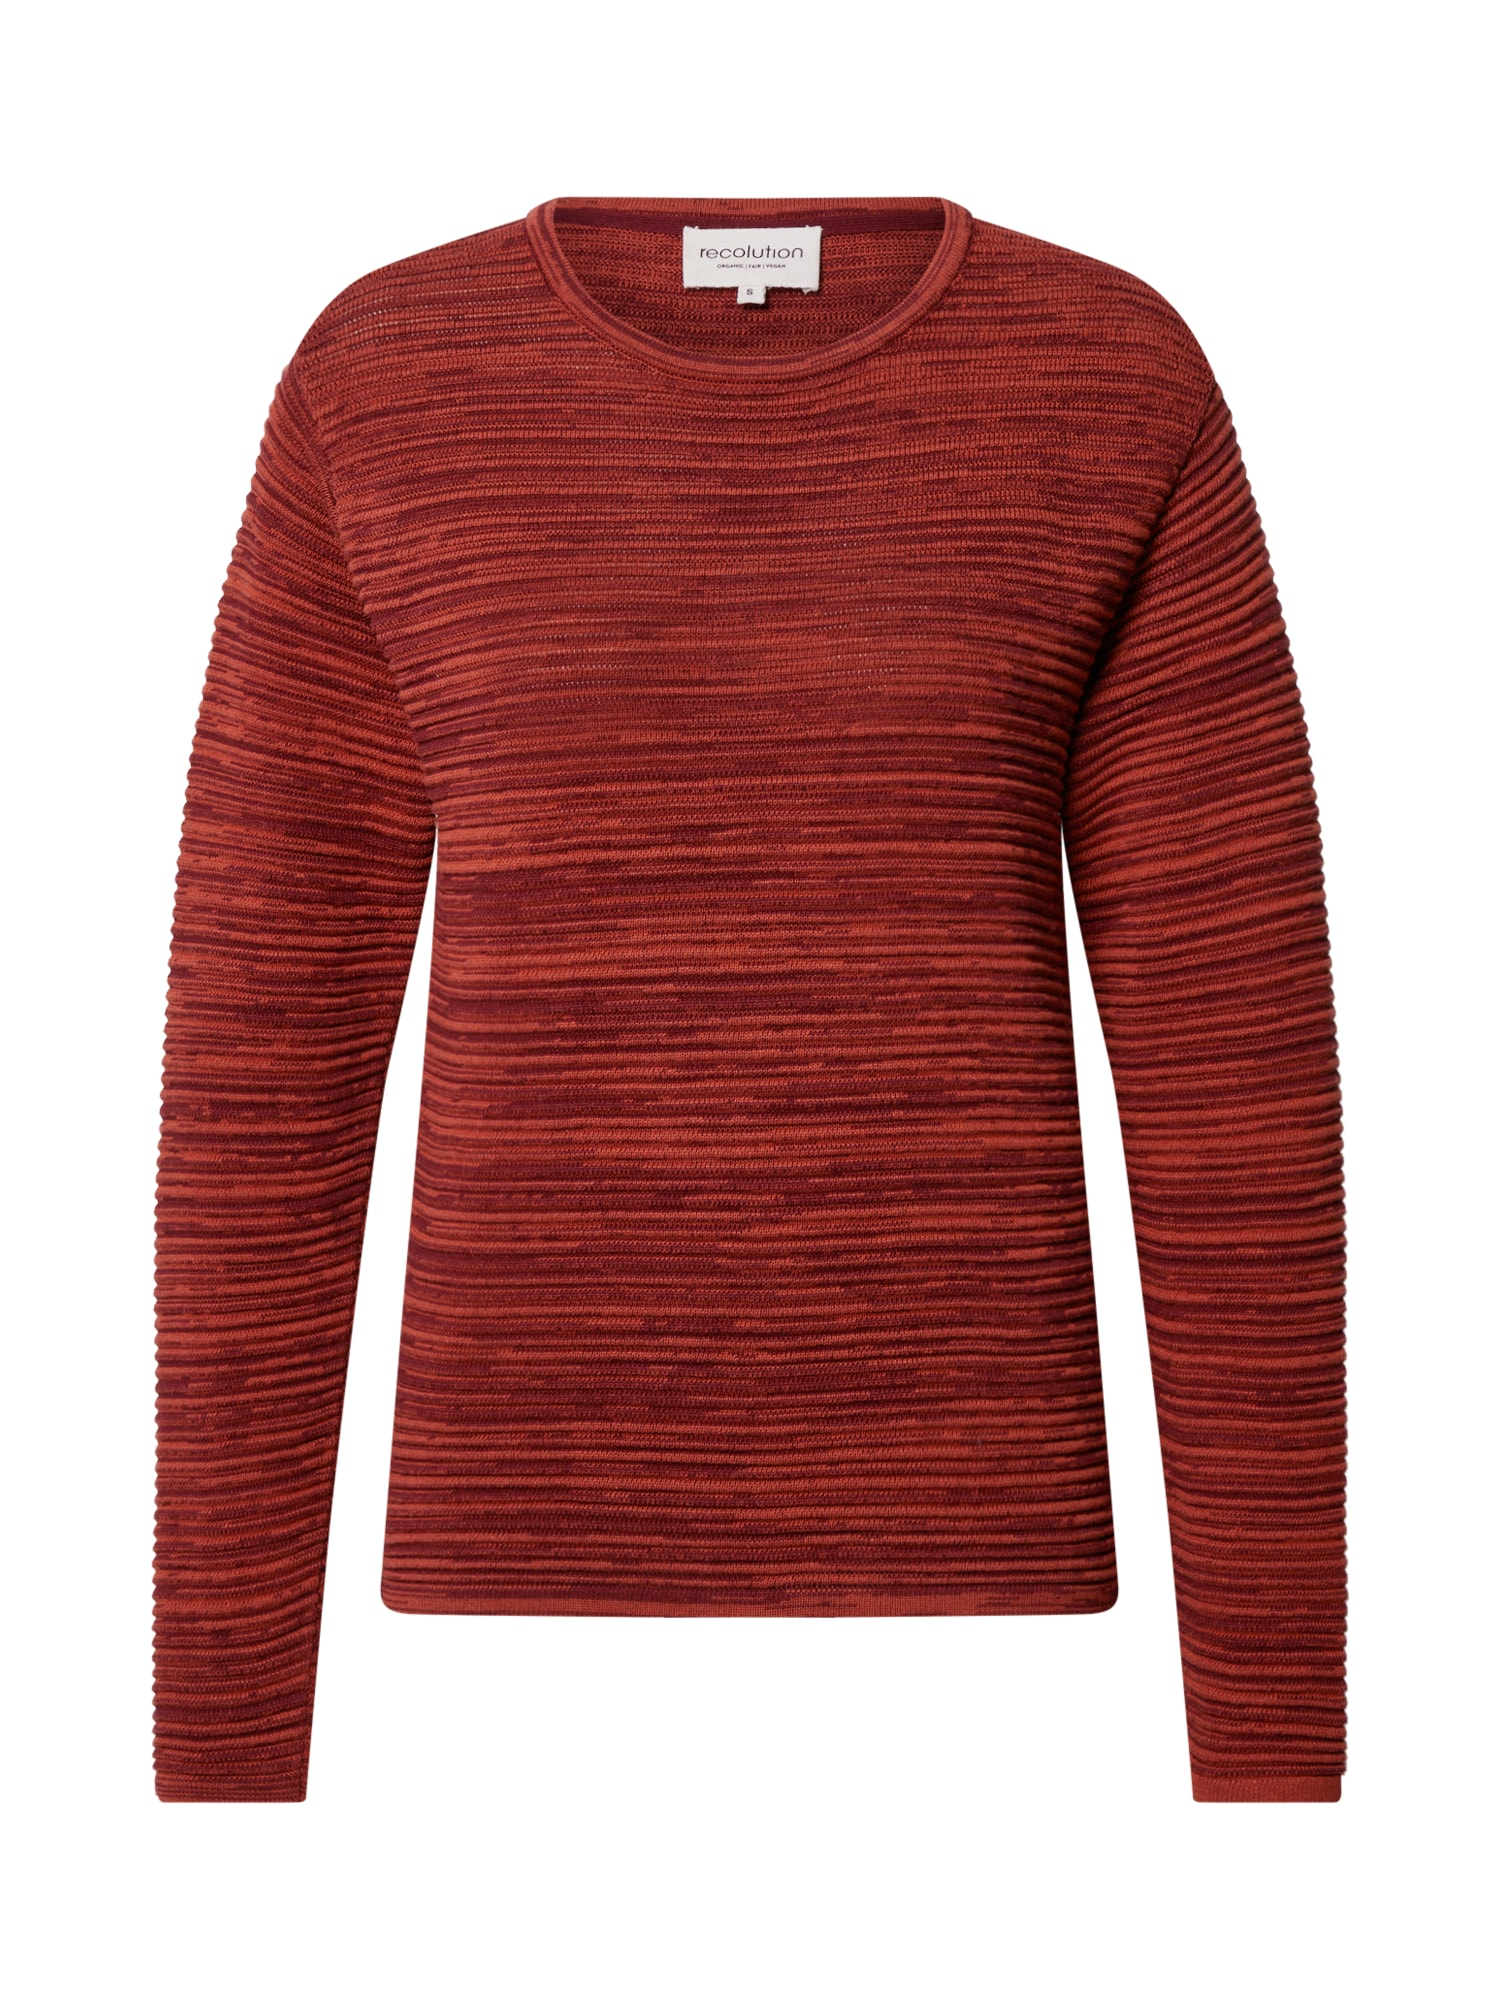 recolution Megztinis raudona